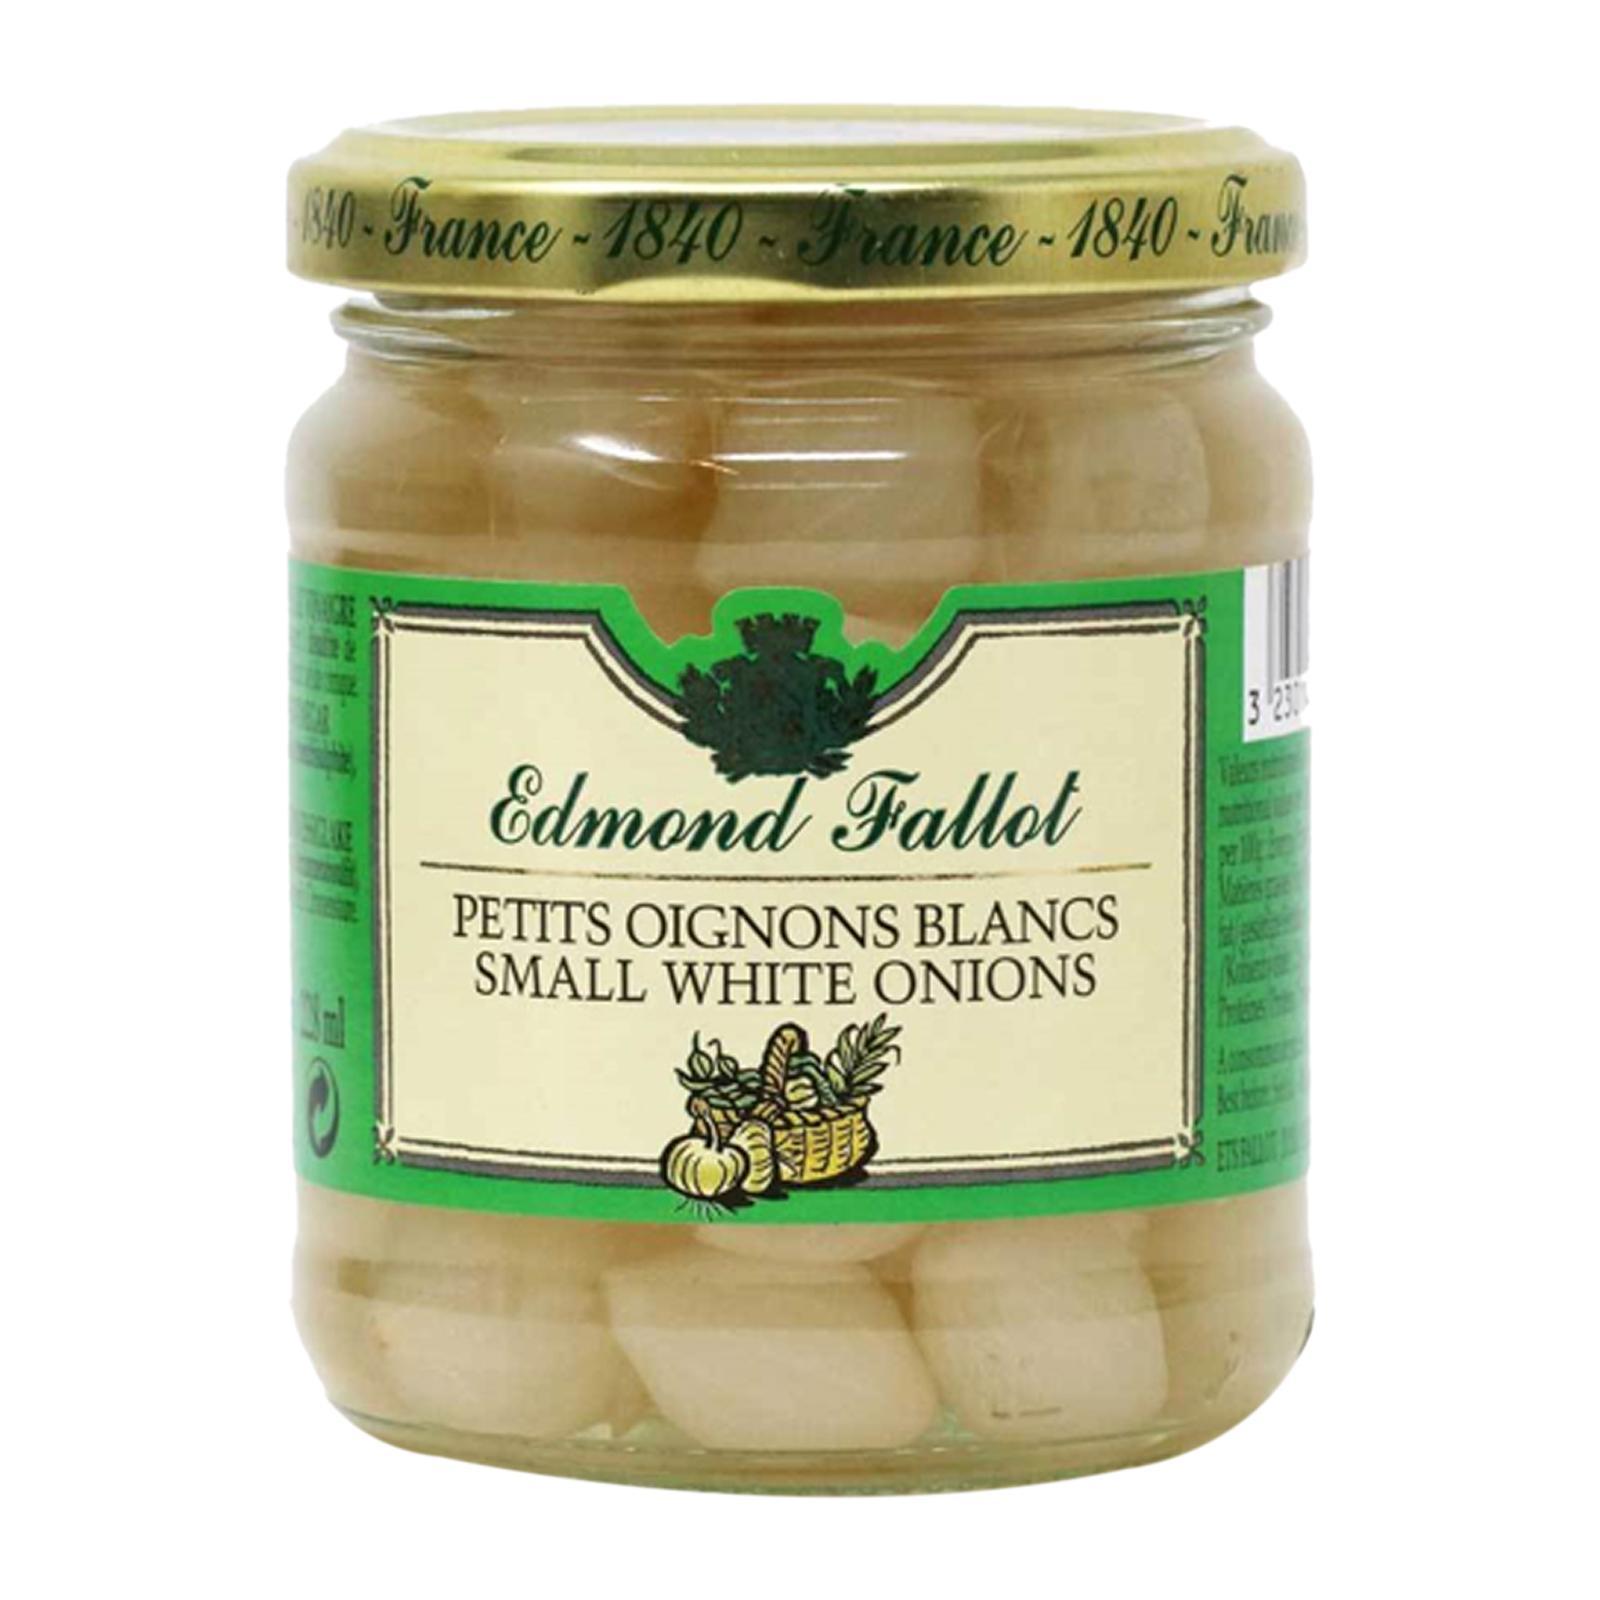 Edmond Fallot Small White Onions - By My Market SG